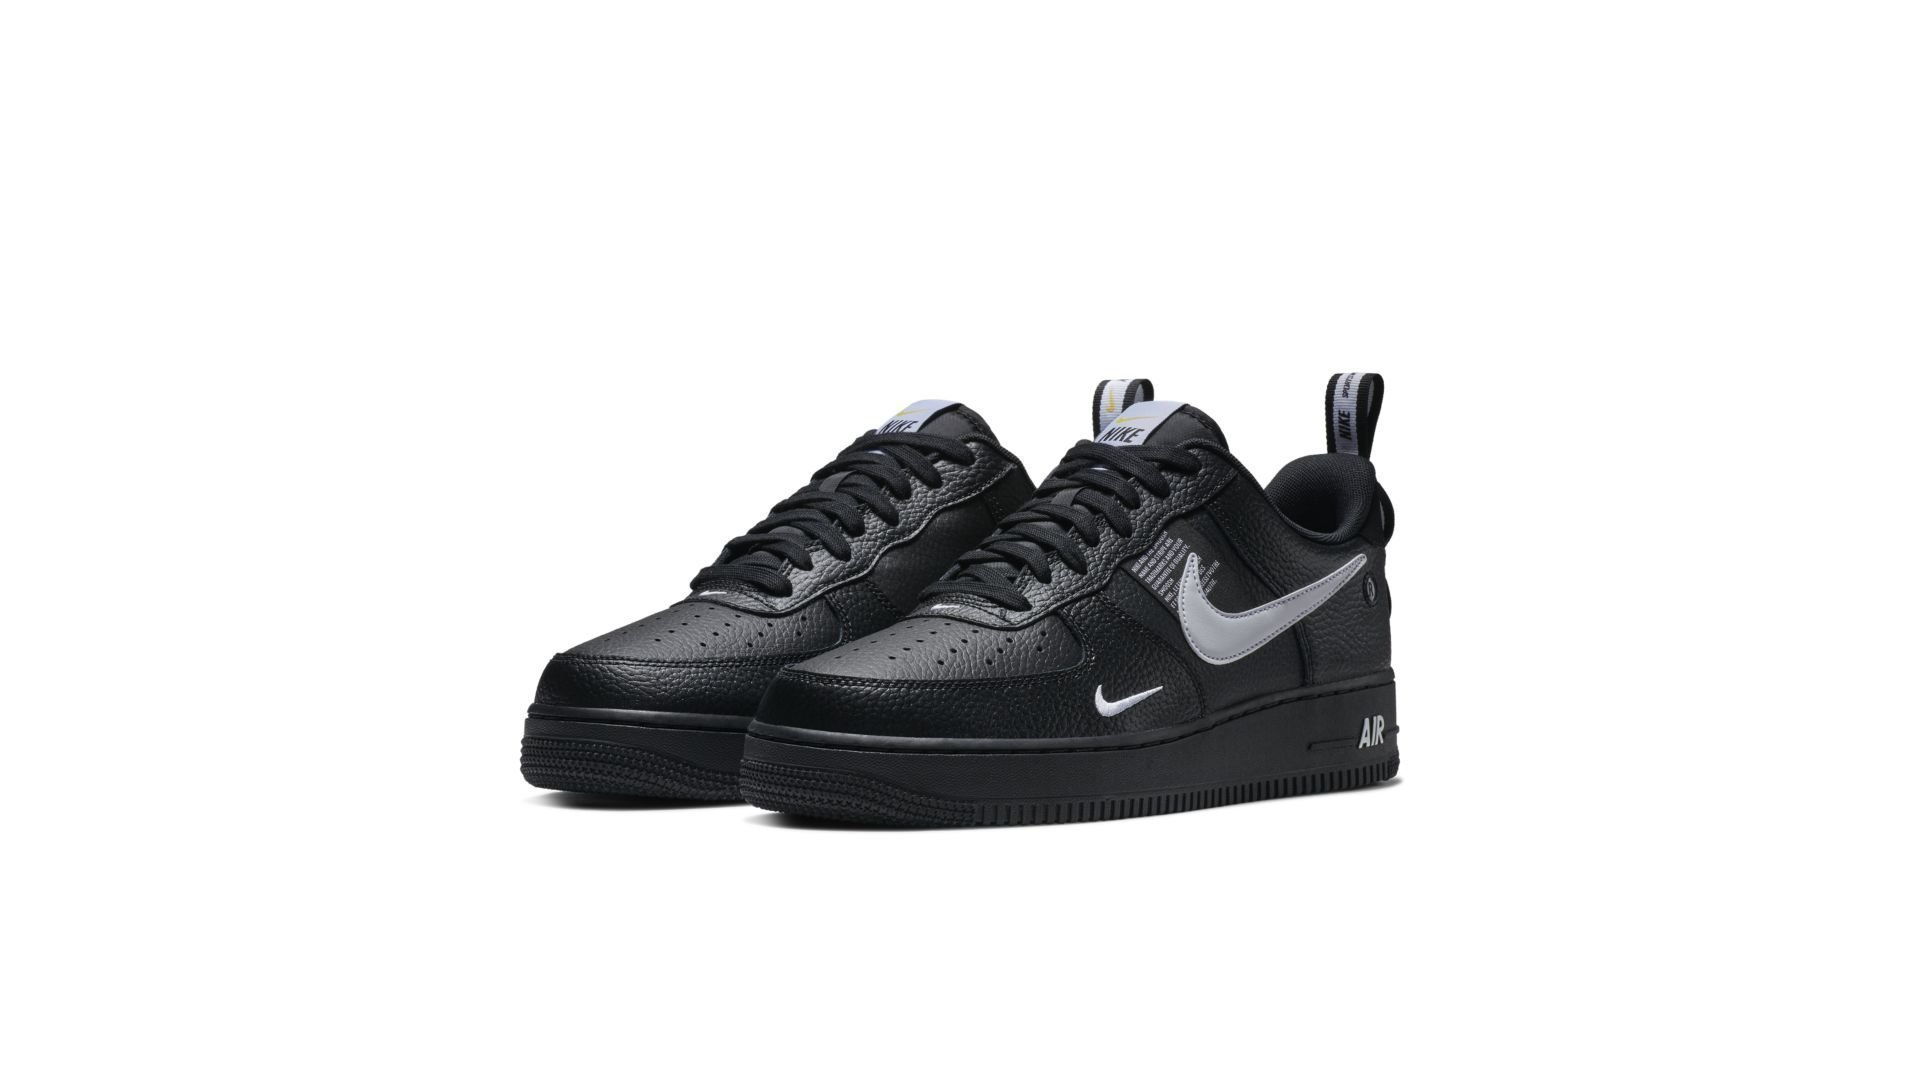 Nike Air Force AJ7747-001